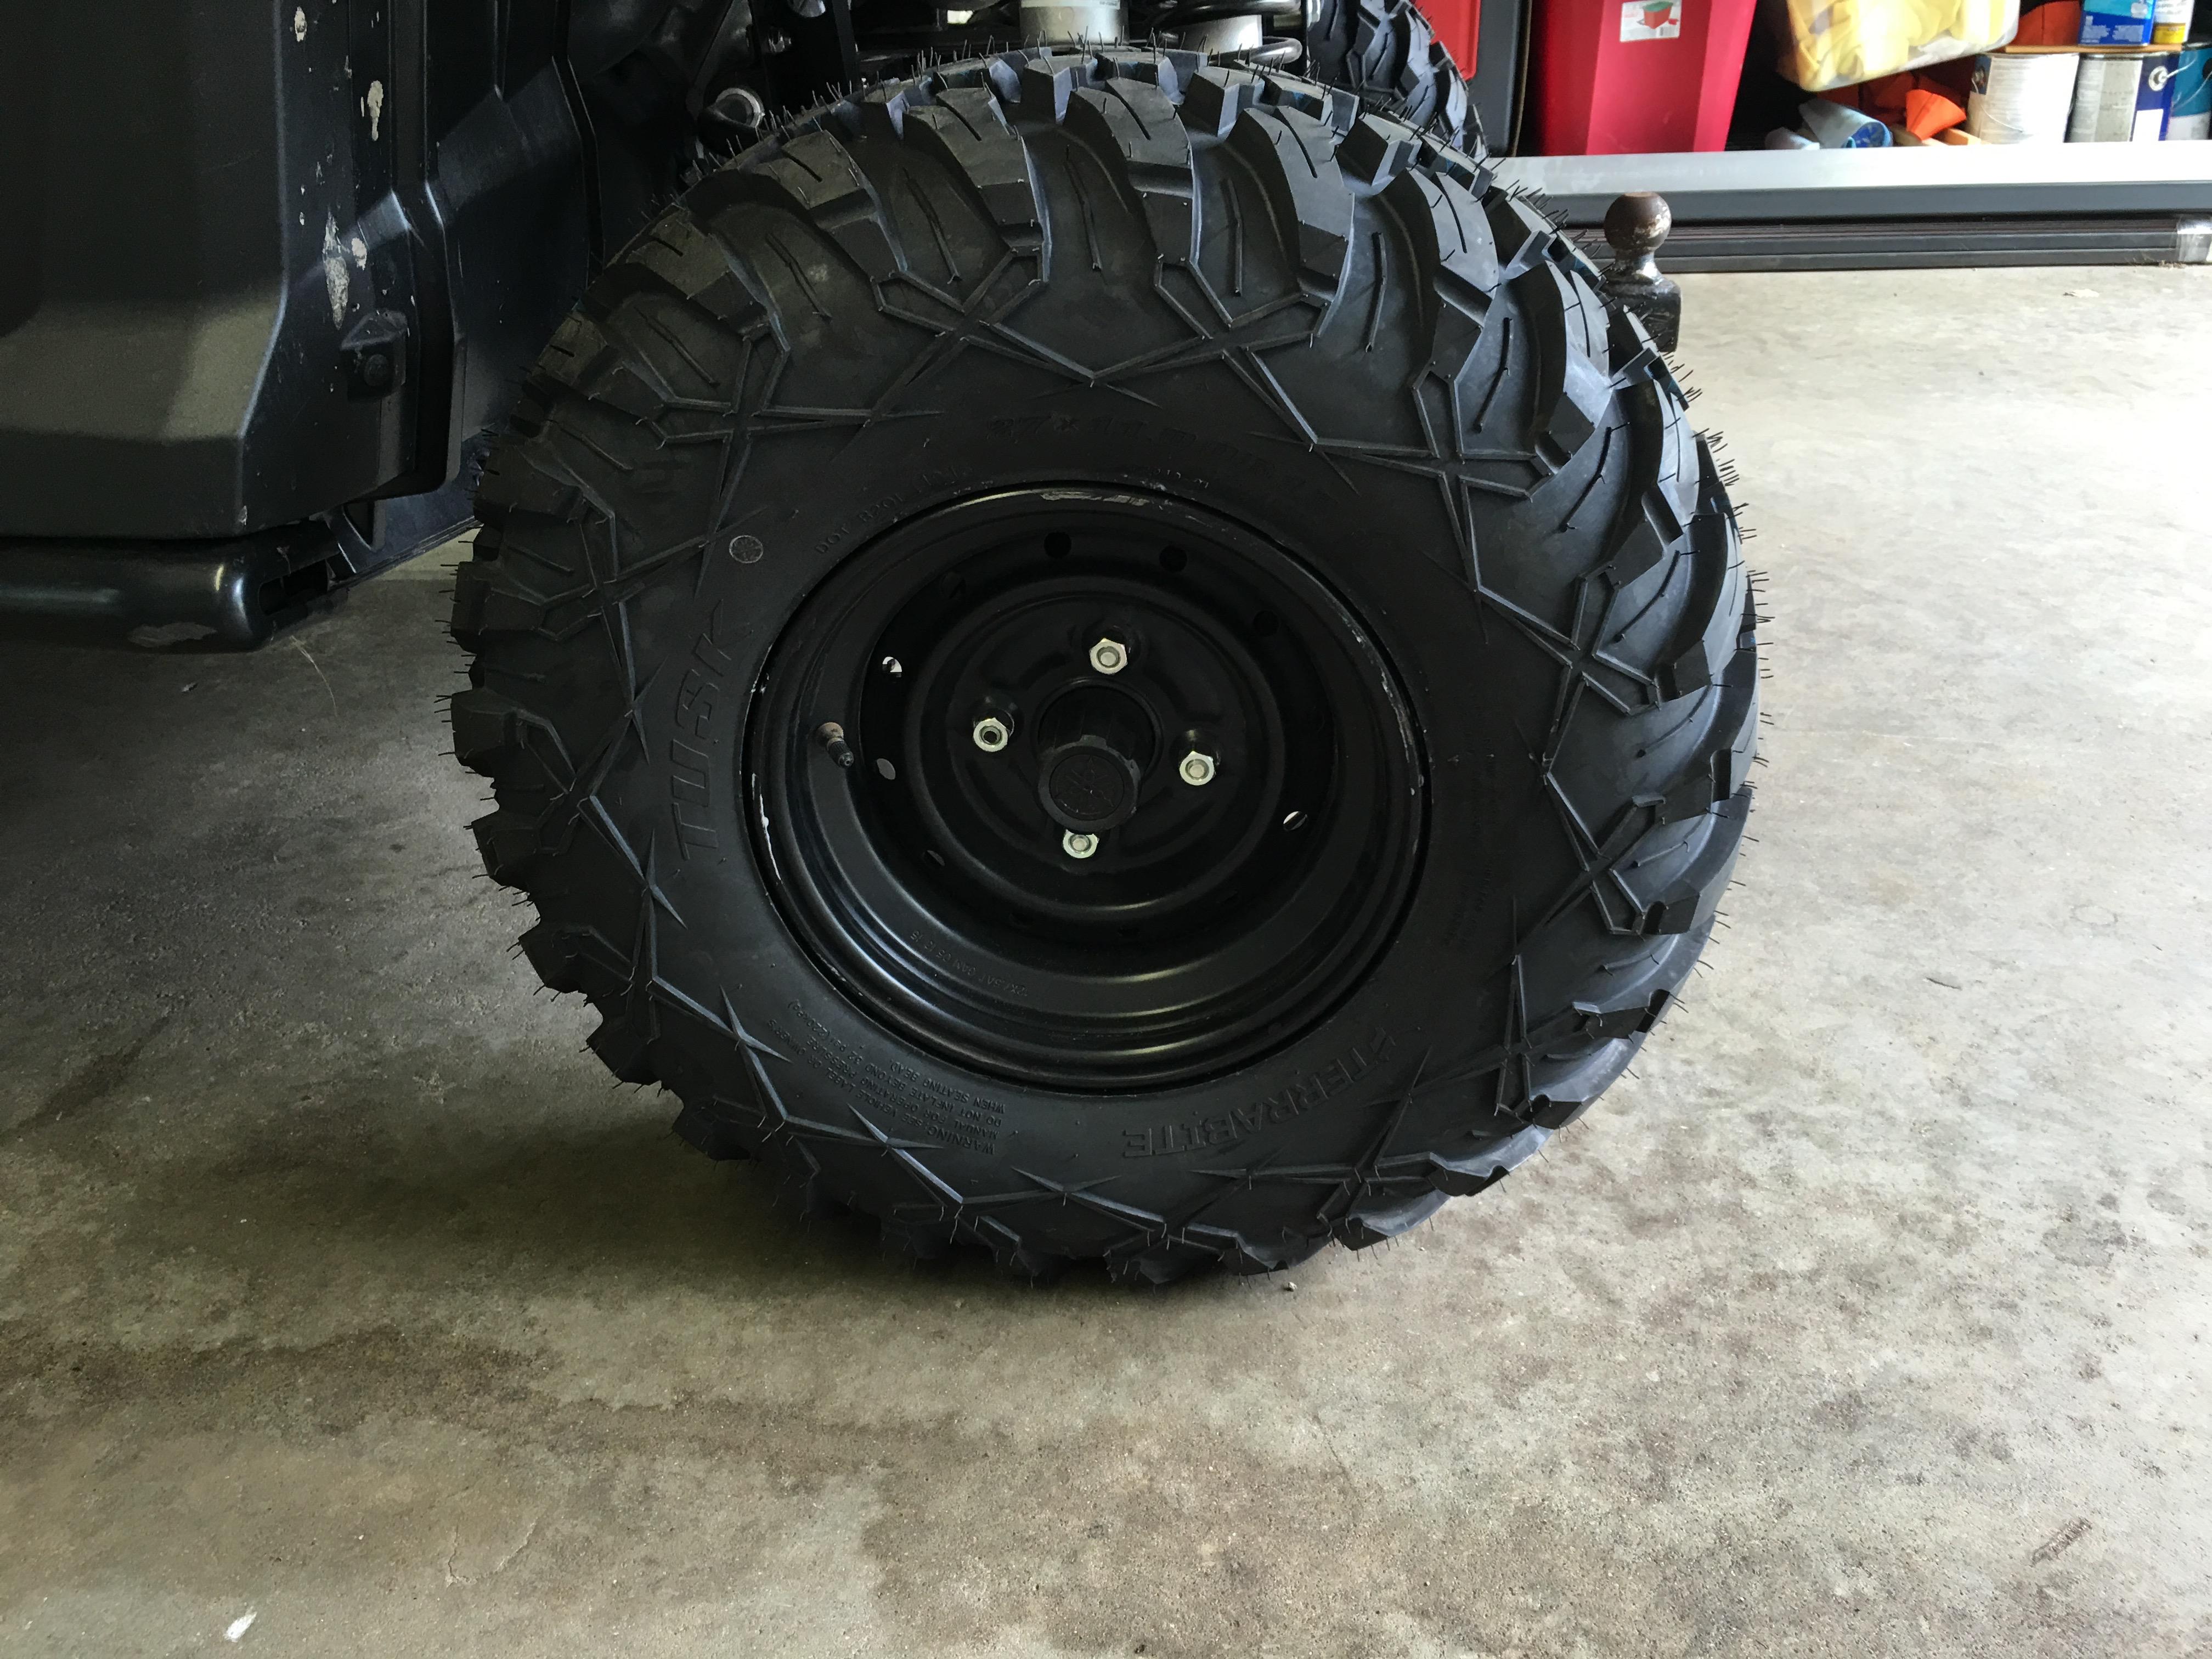 Tusk Tires